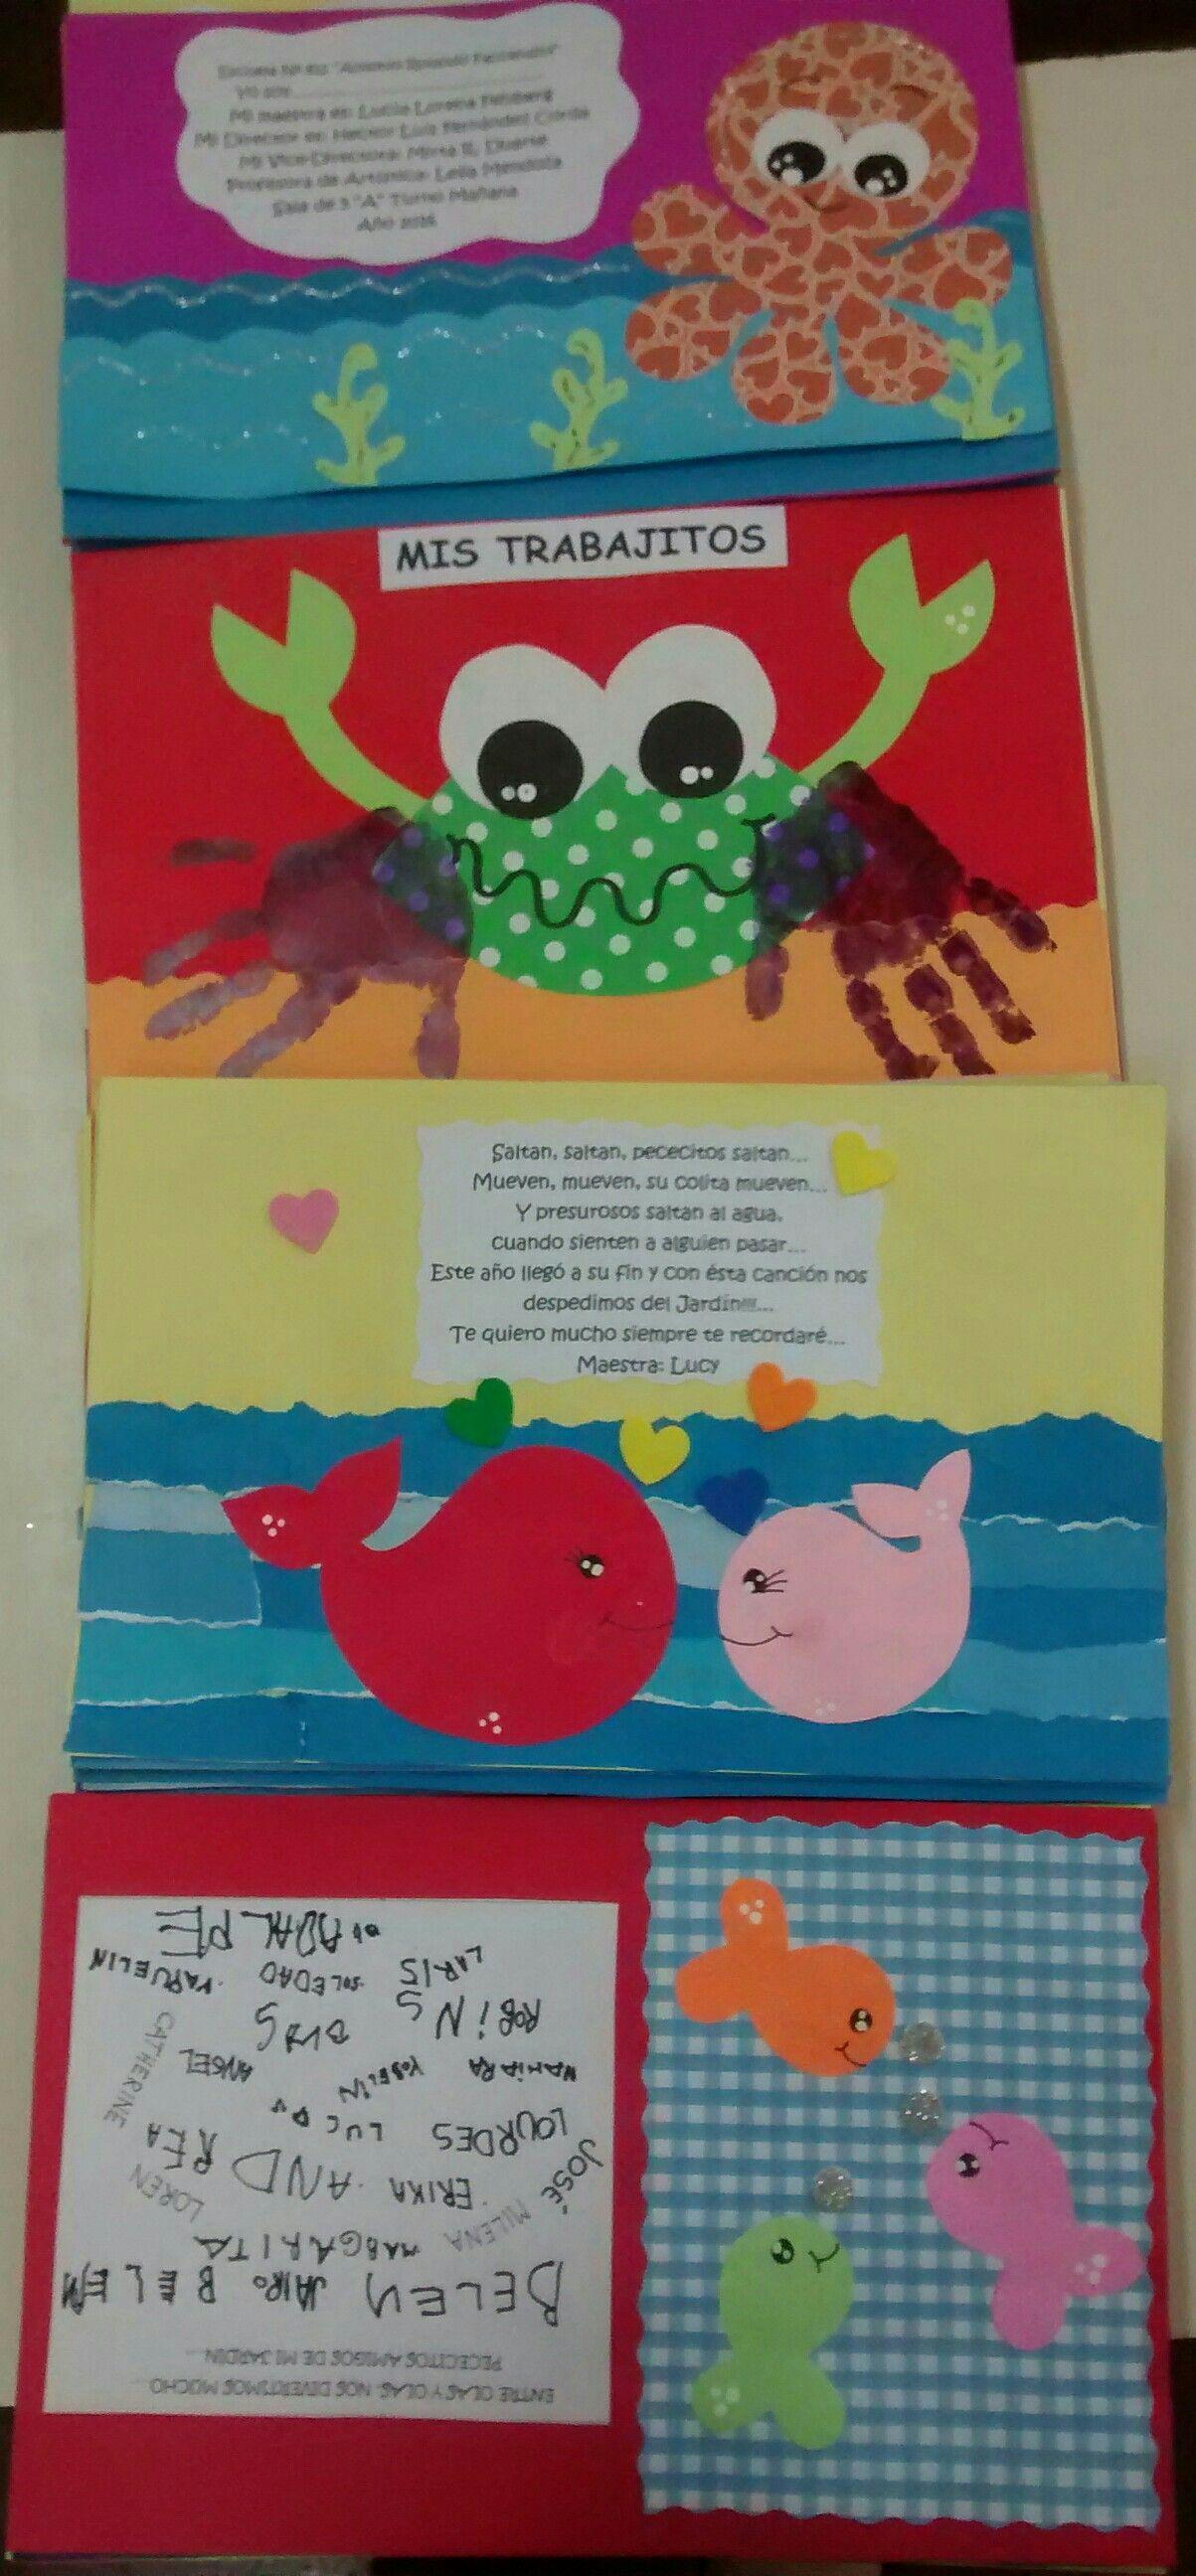 Carpeta 1 Etapa Carpeta Diseno De Carpeta Carpetas Escolares